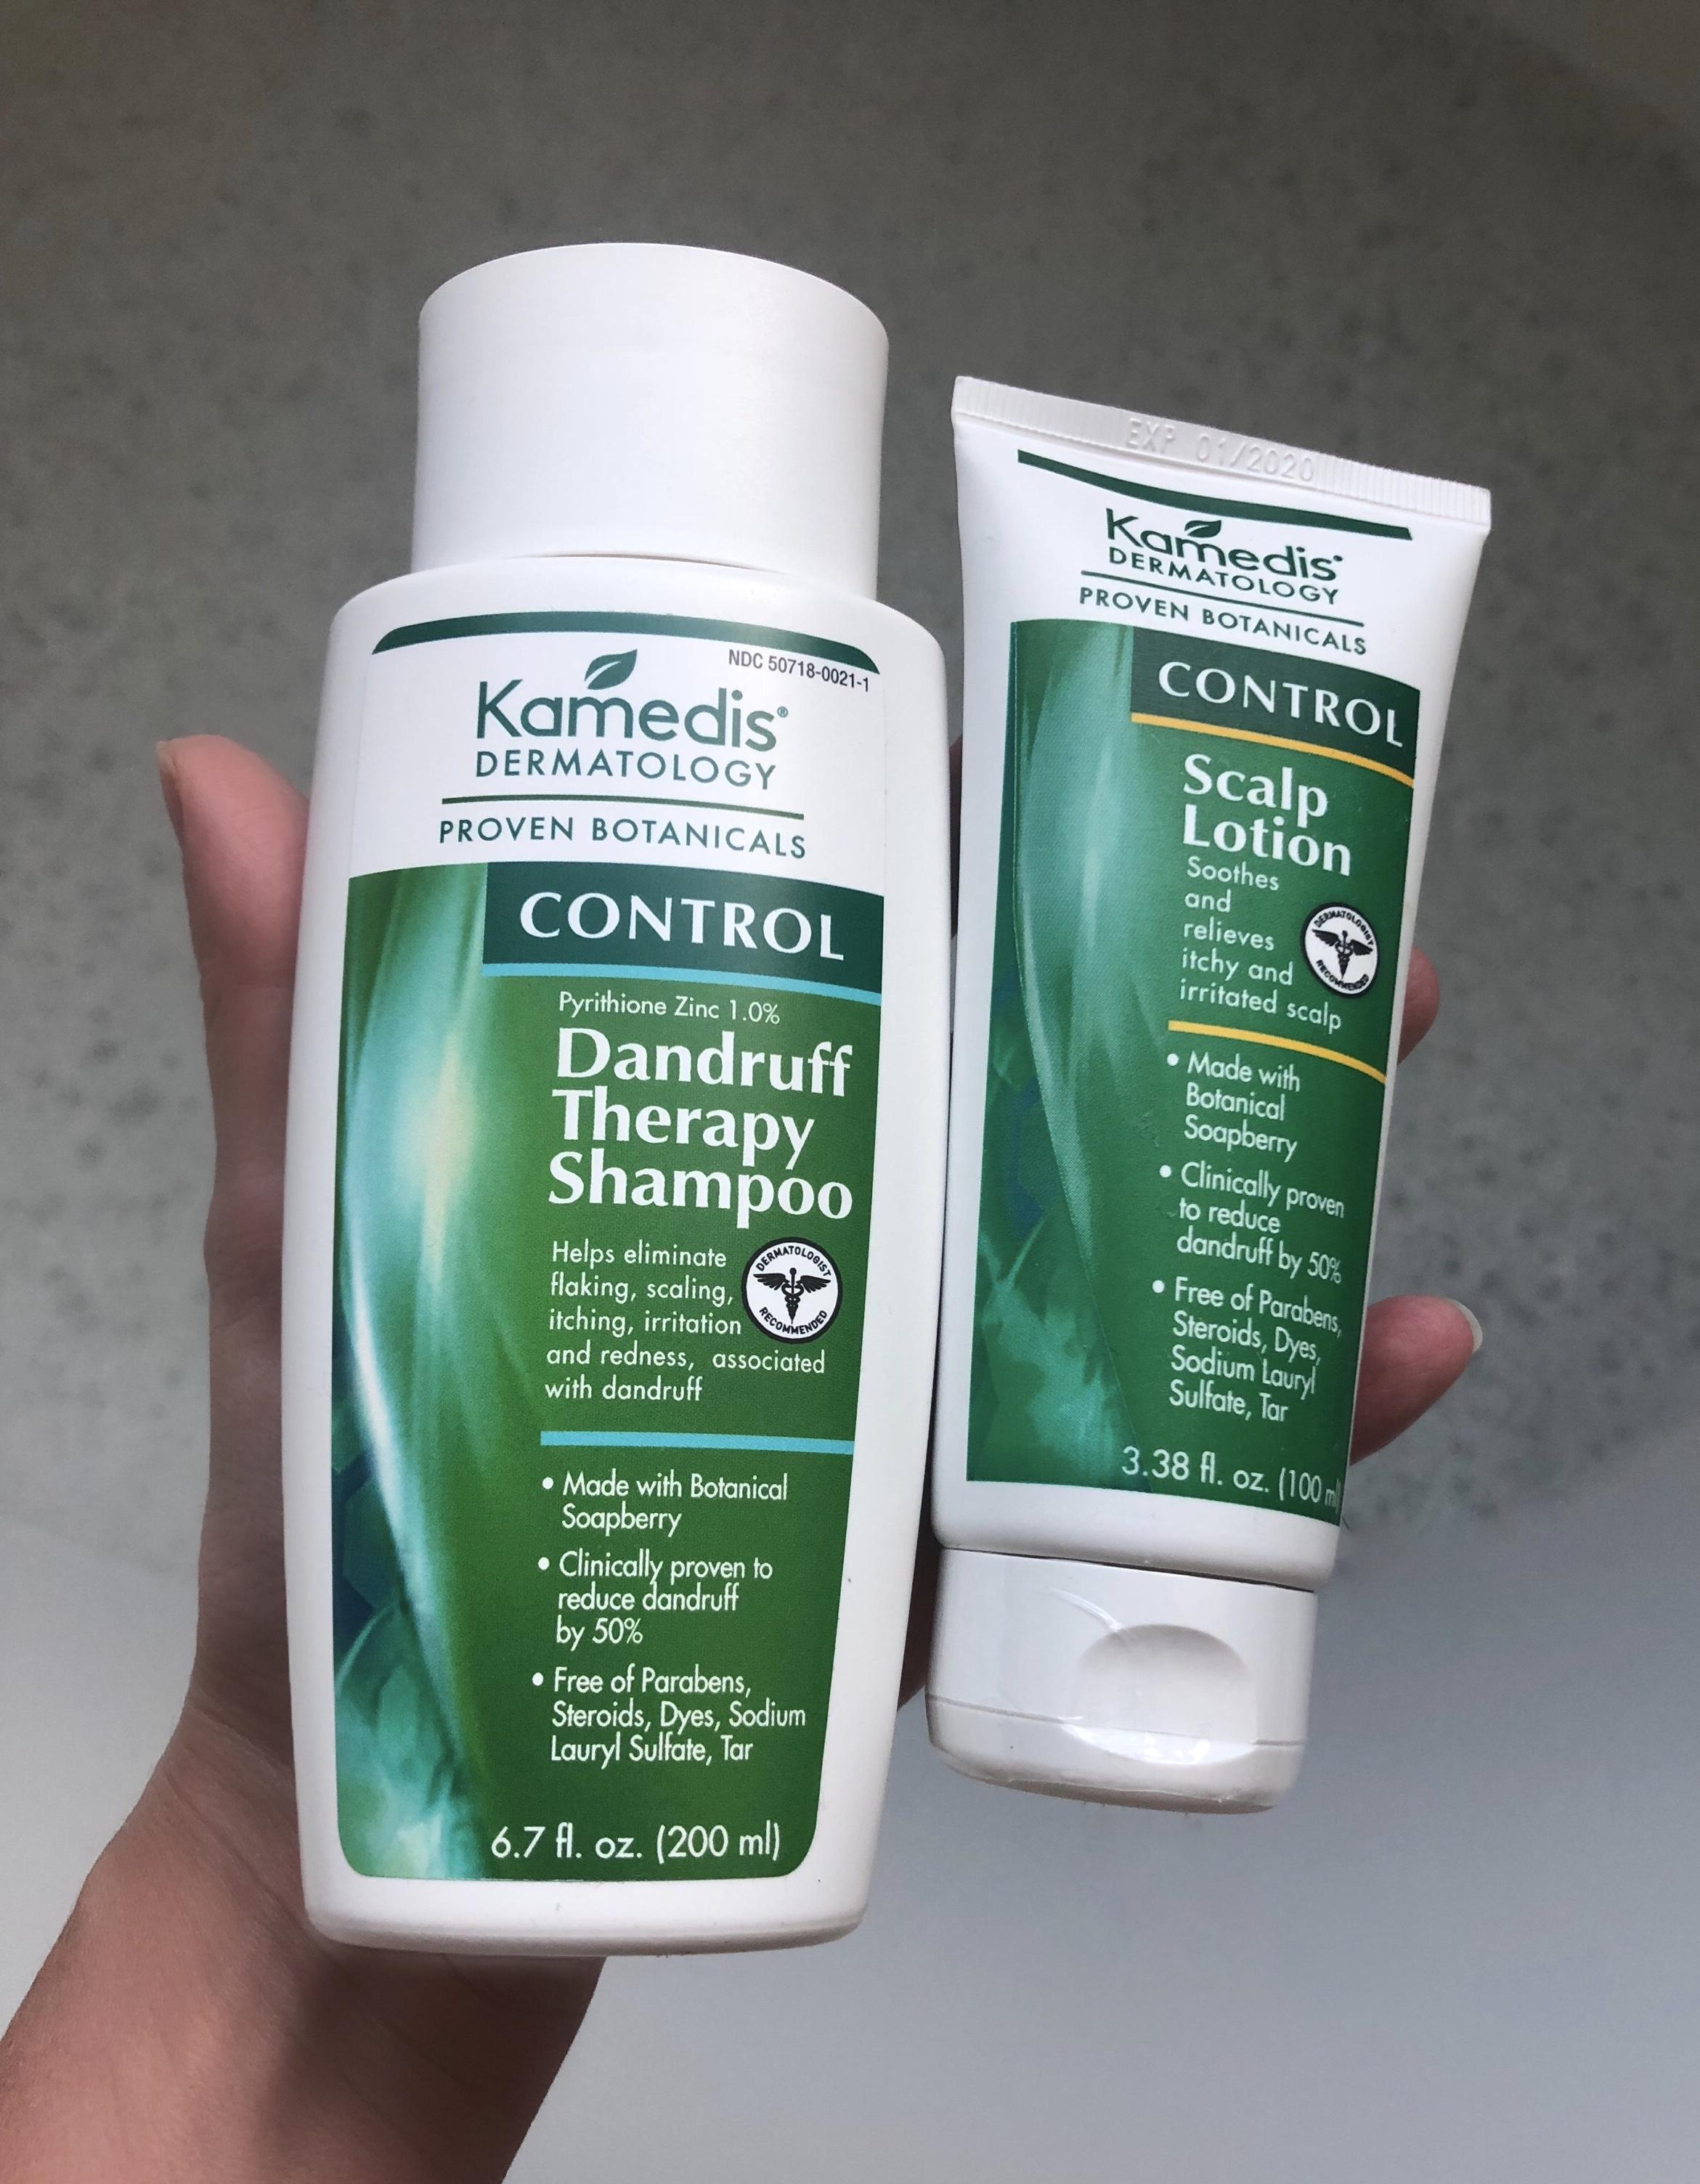 dandruff therapy shampoo